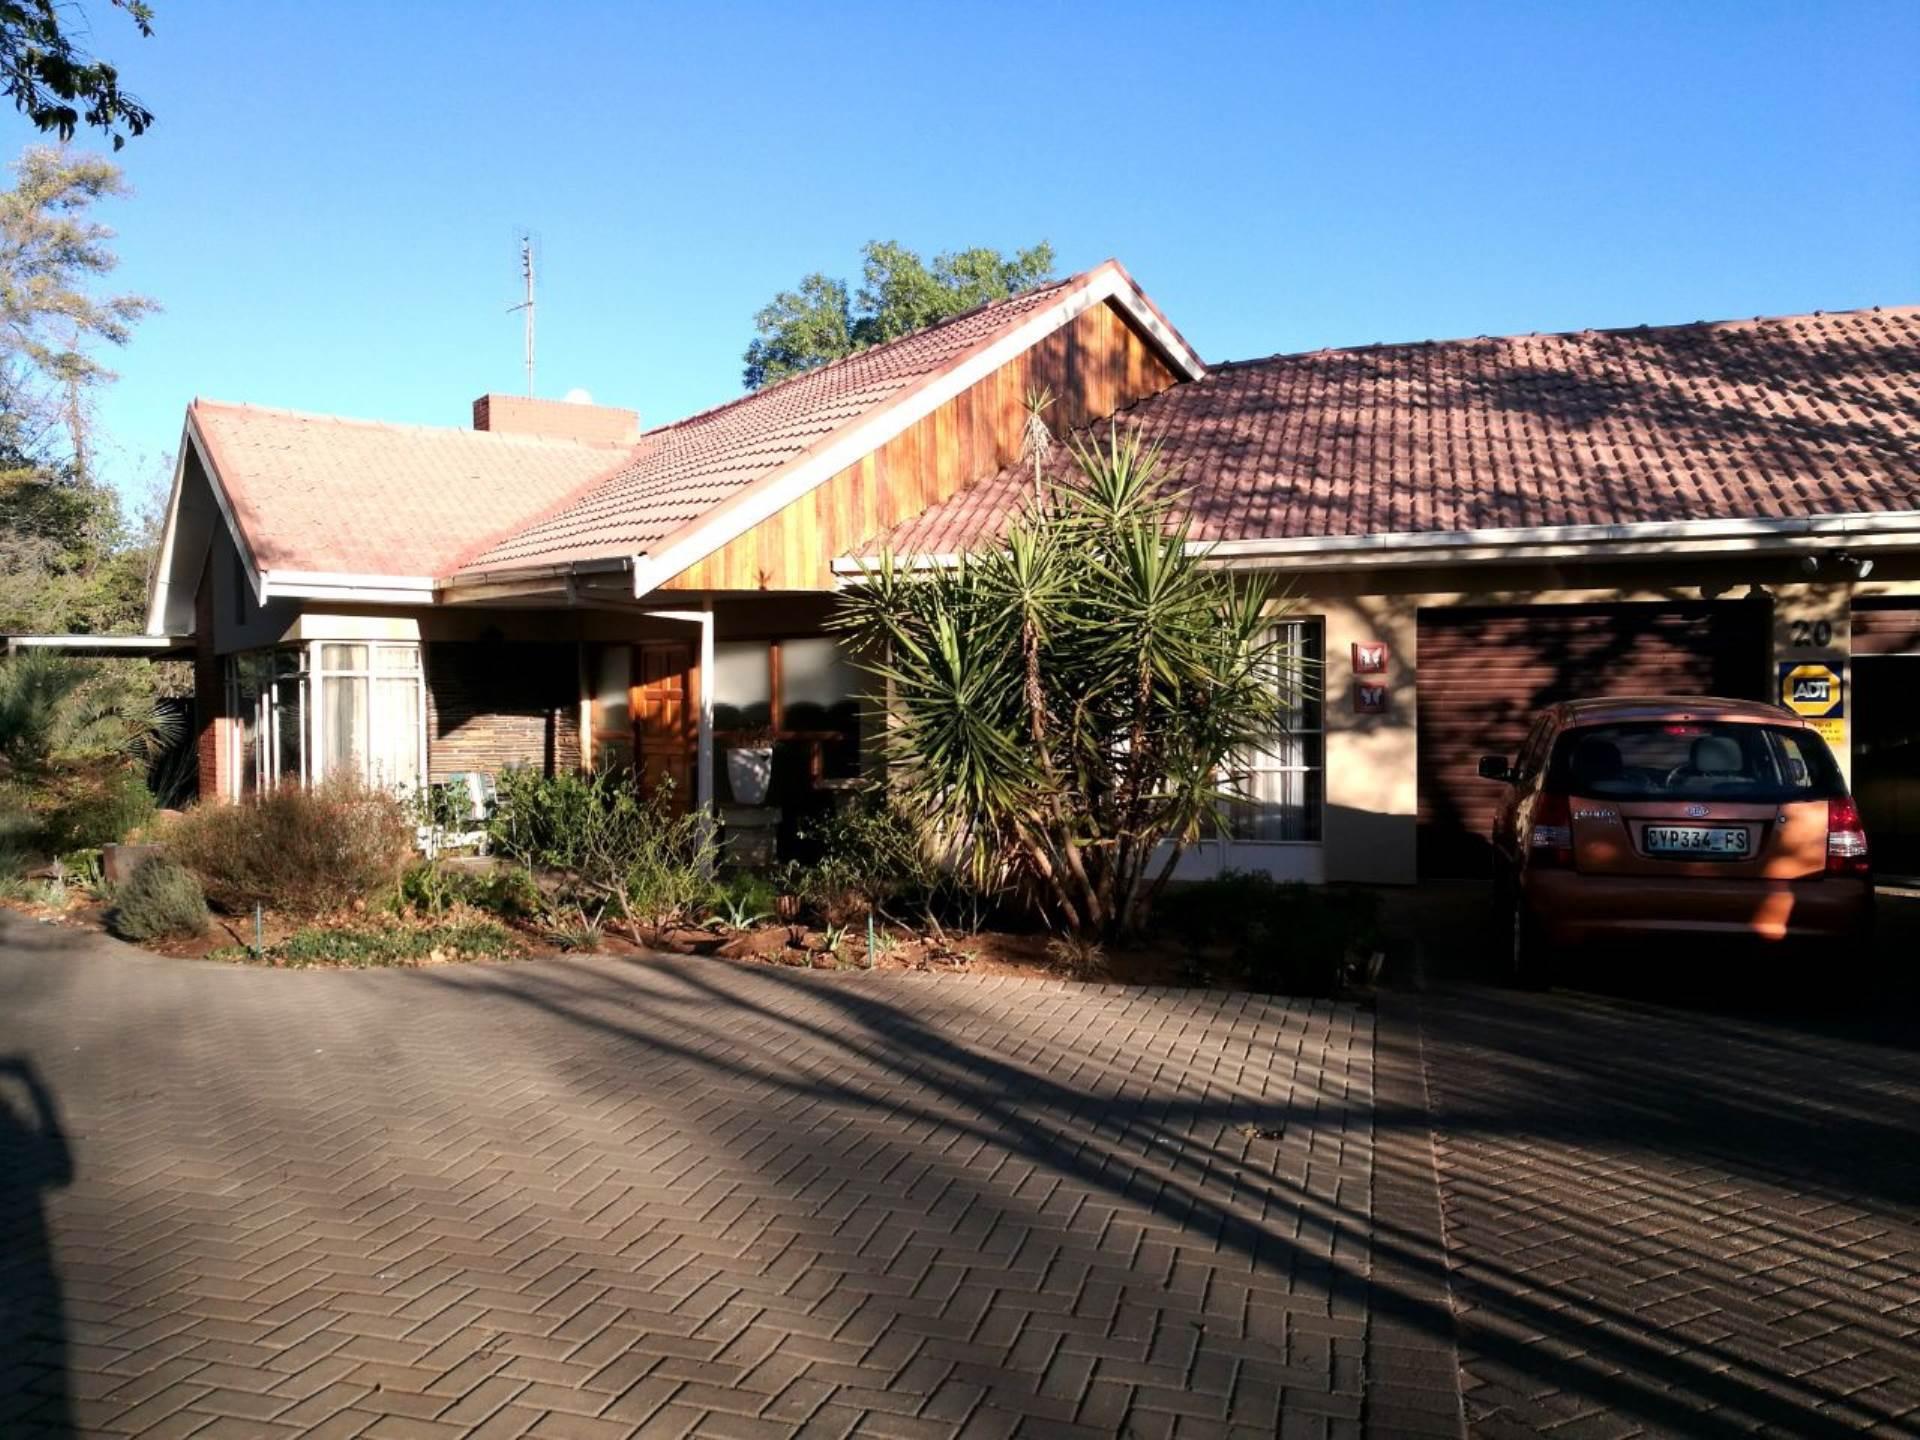 5 BedroomHouse For Sale In Universitas